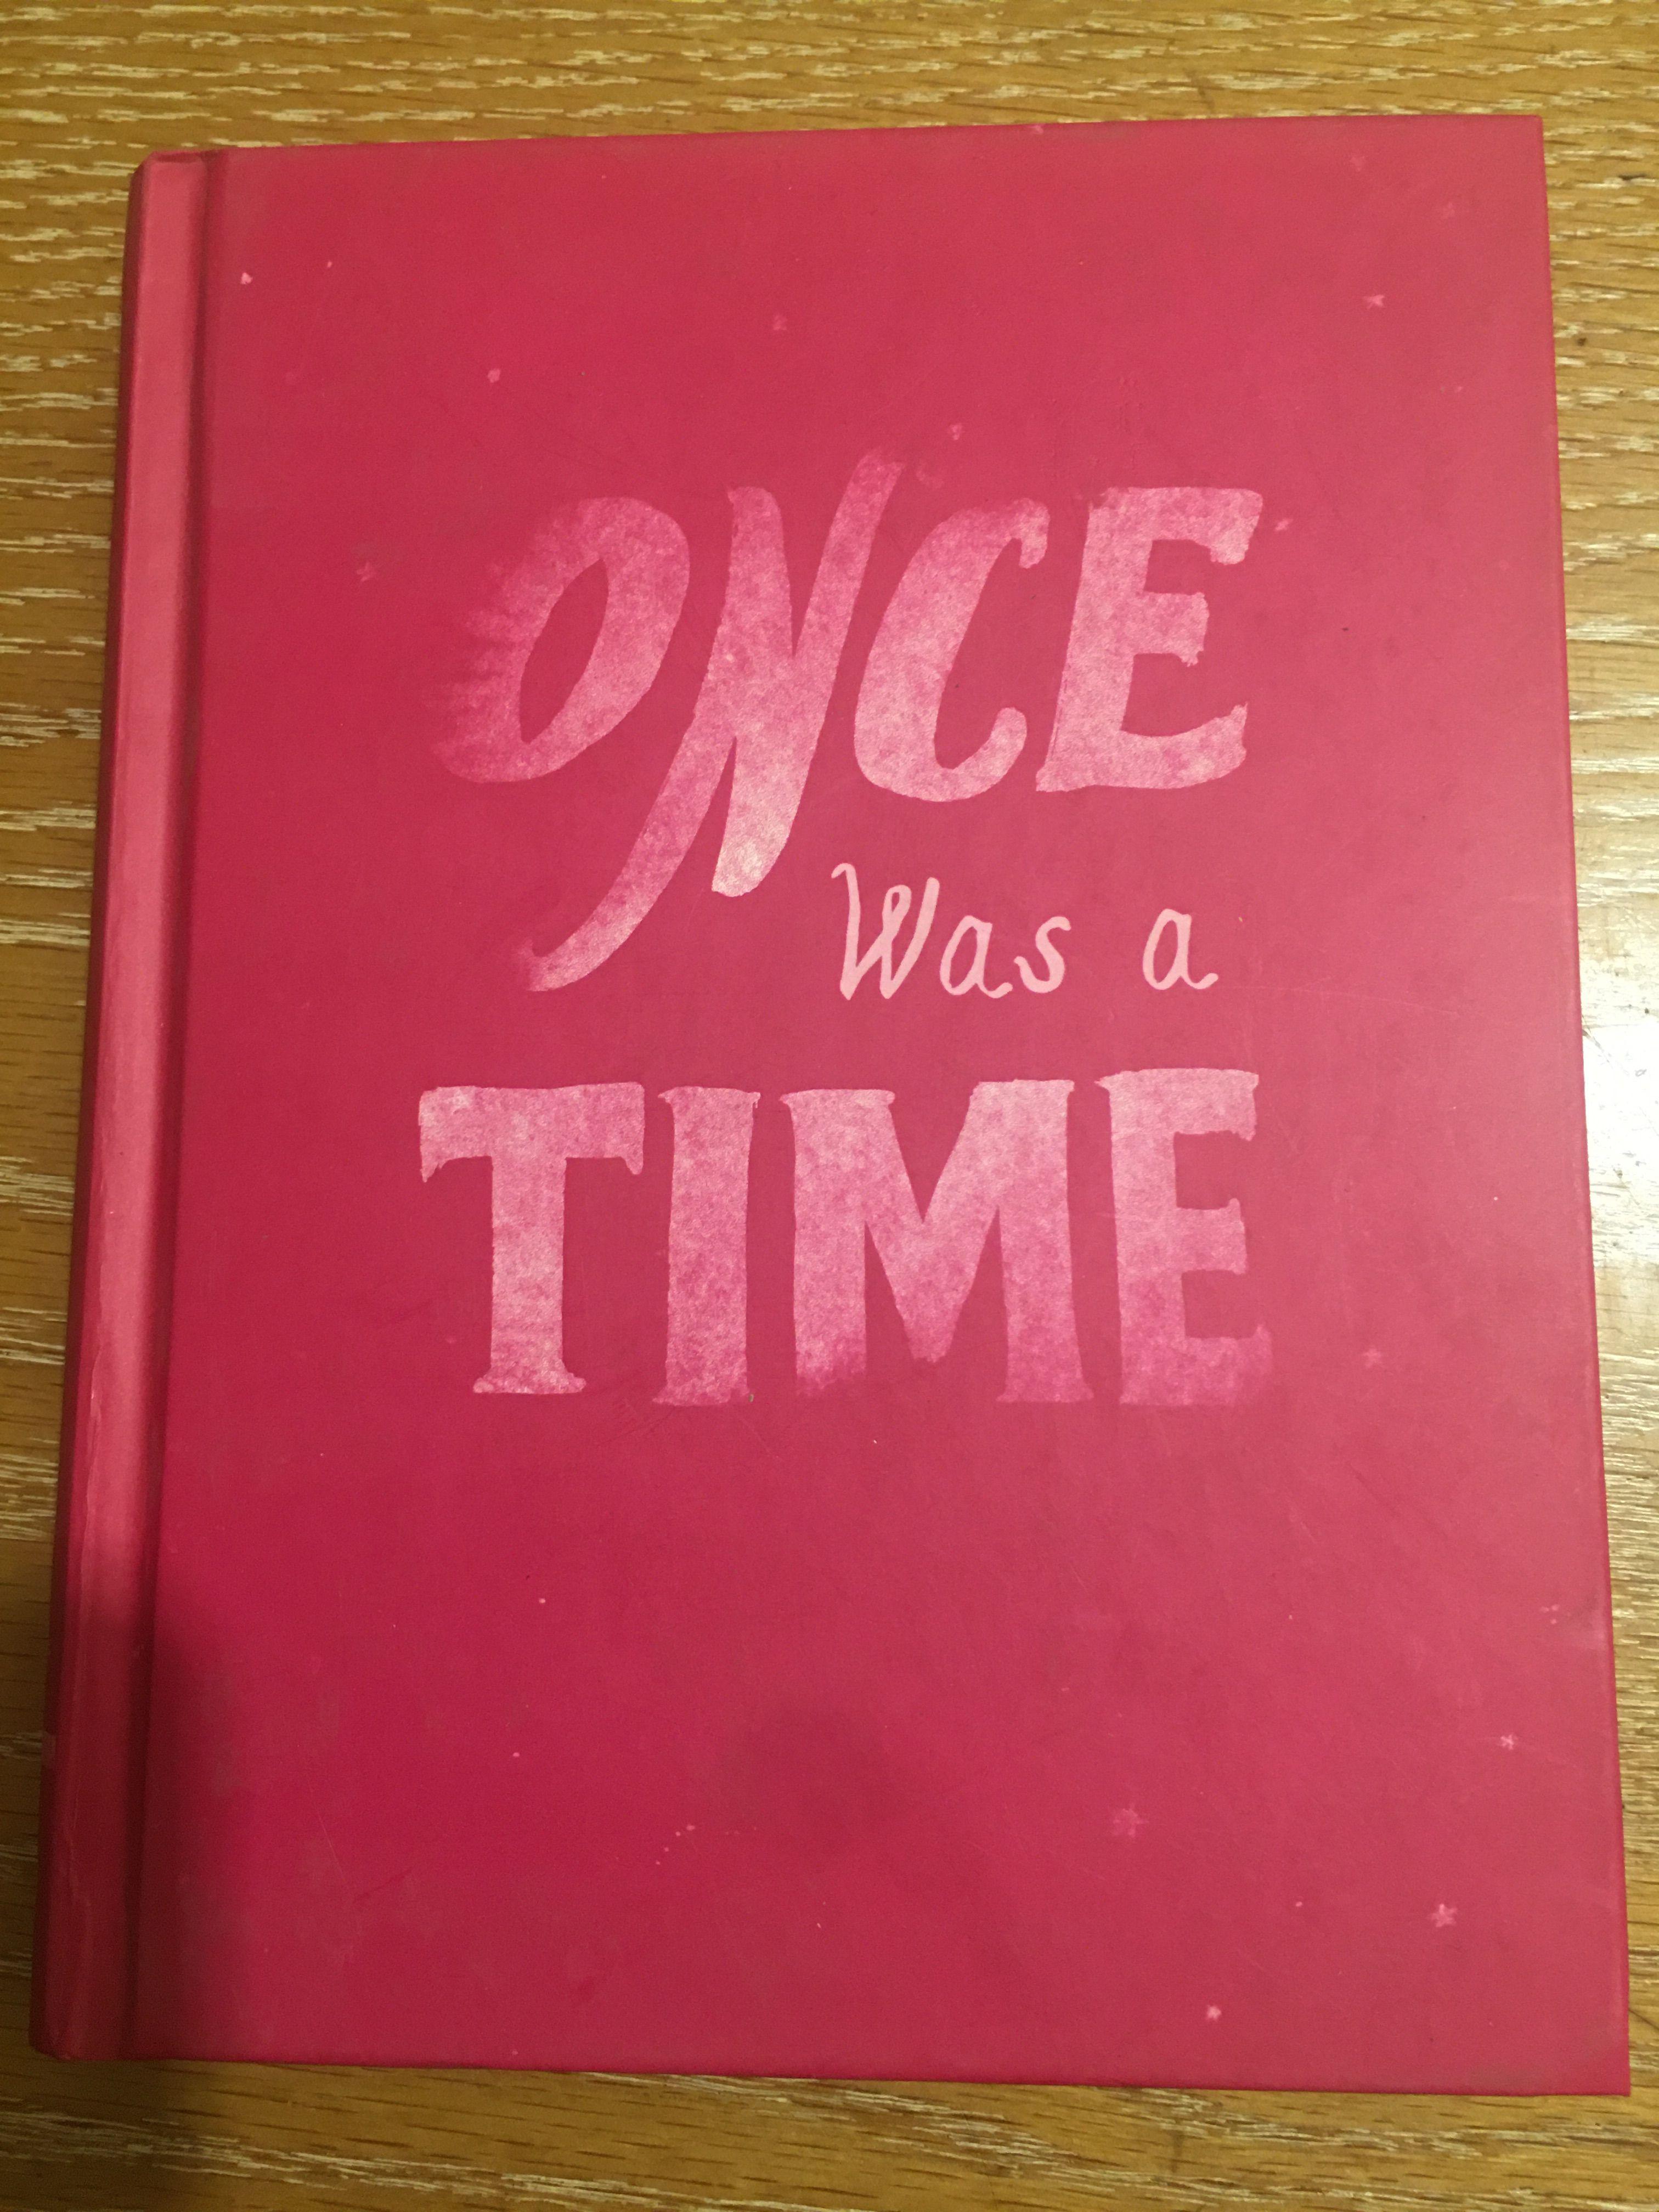 272頁精裝版 Once Was a Time 孩子必讀友誼書 Leila Sales 作品